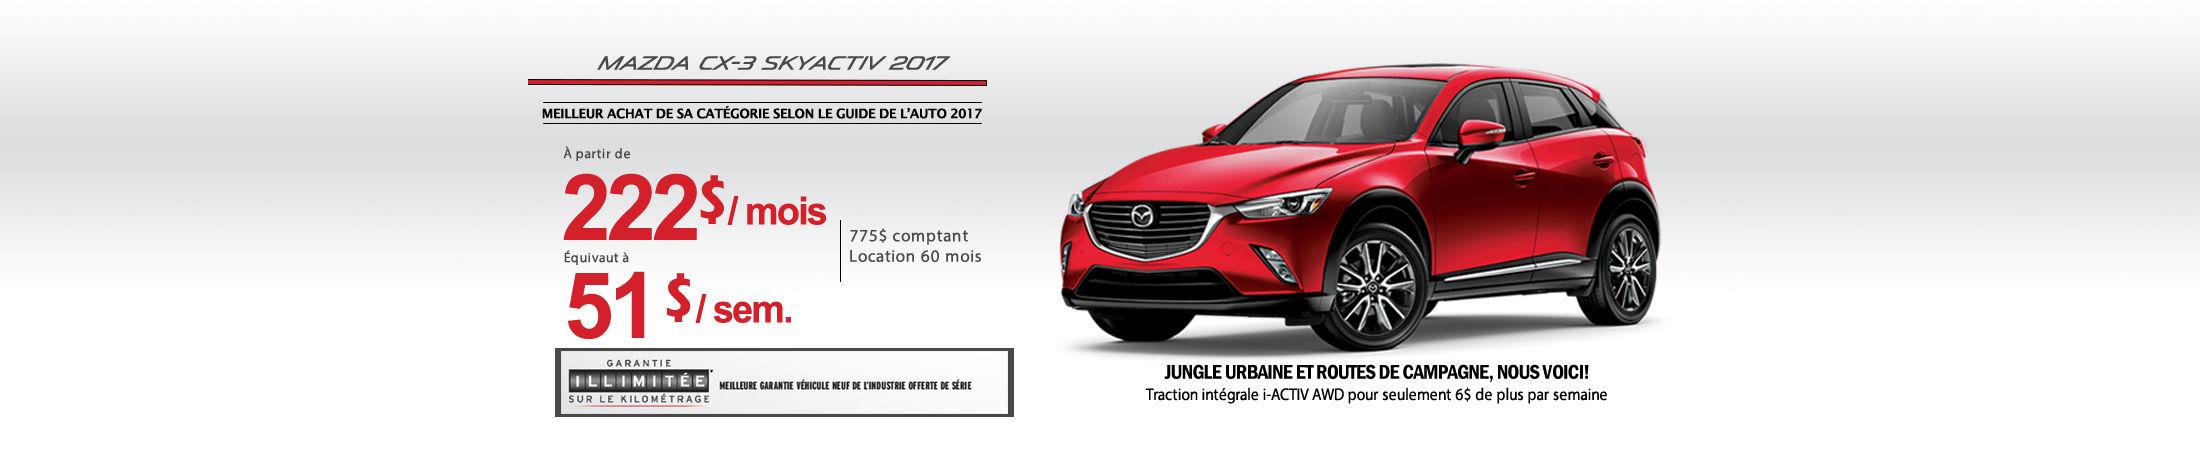 2017 Mazda CX-3 Banner (Copy)